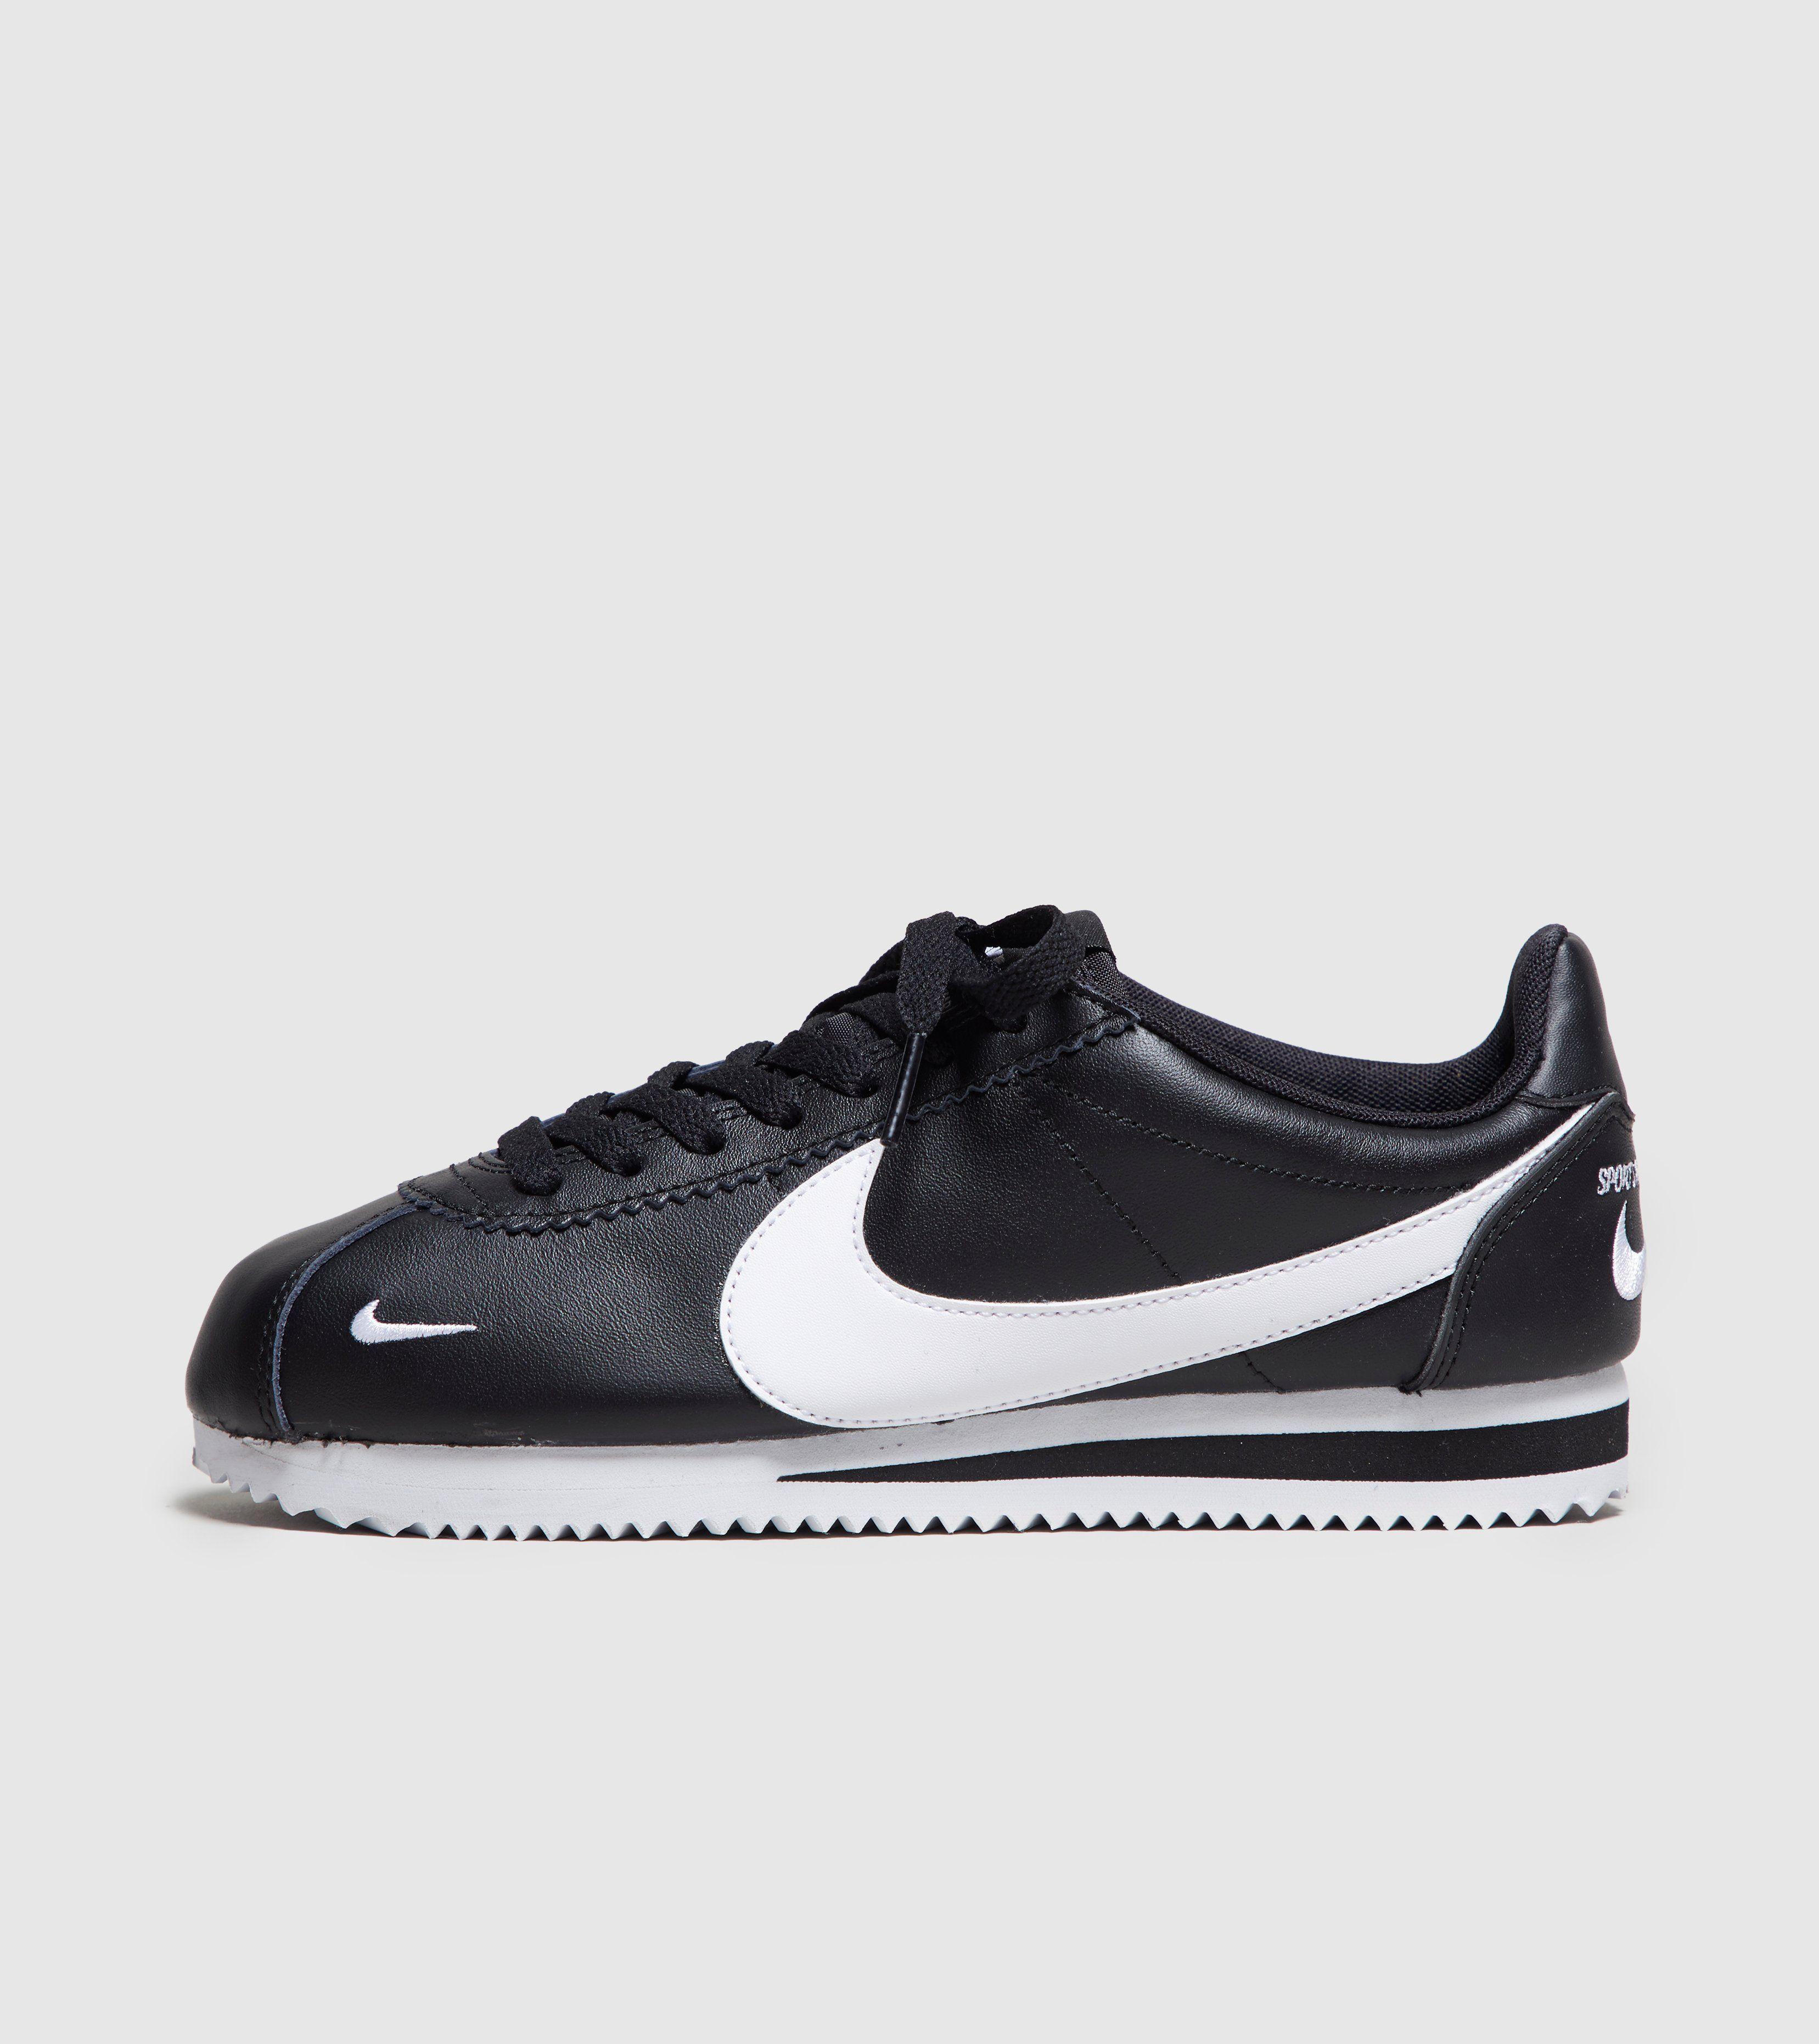 7c52a58964b Nike Cortez Premium Women s